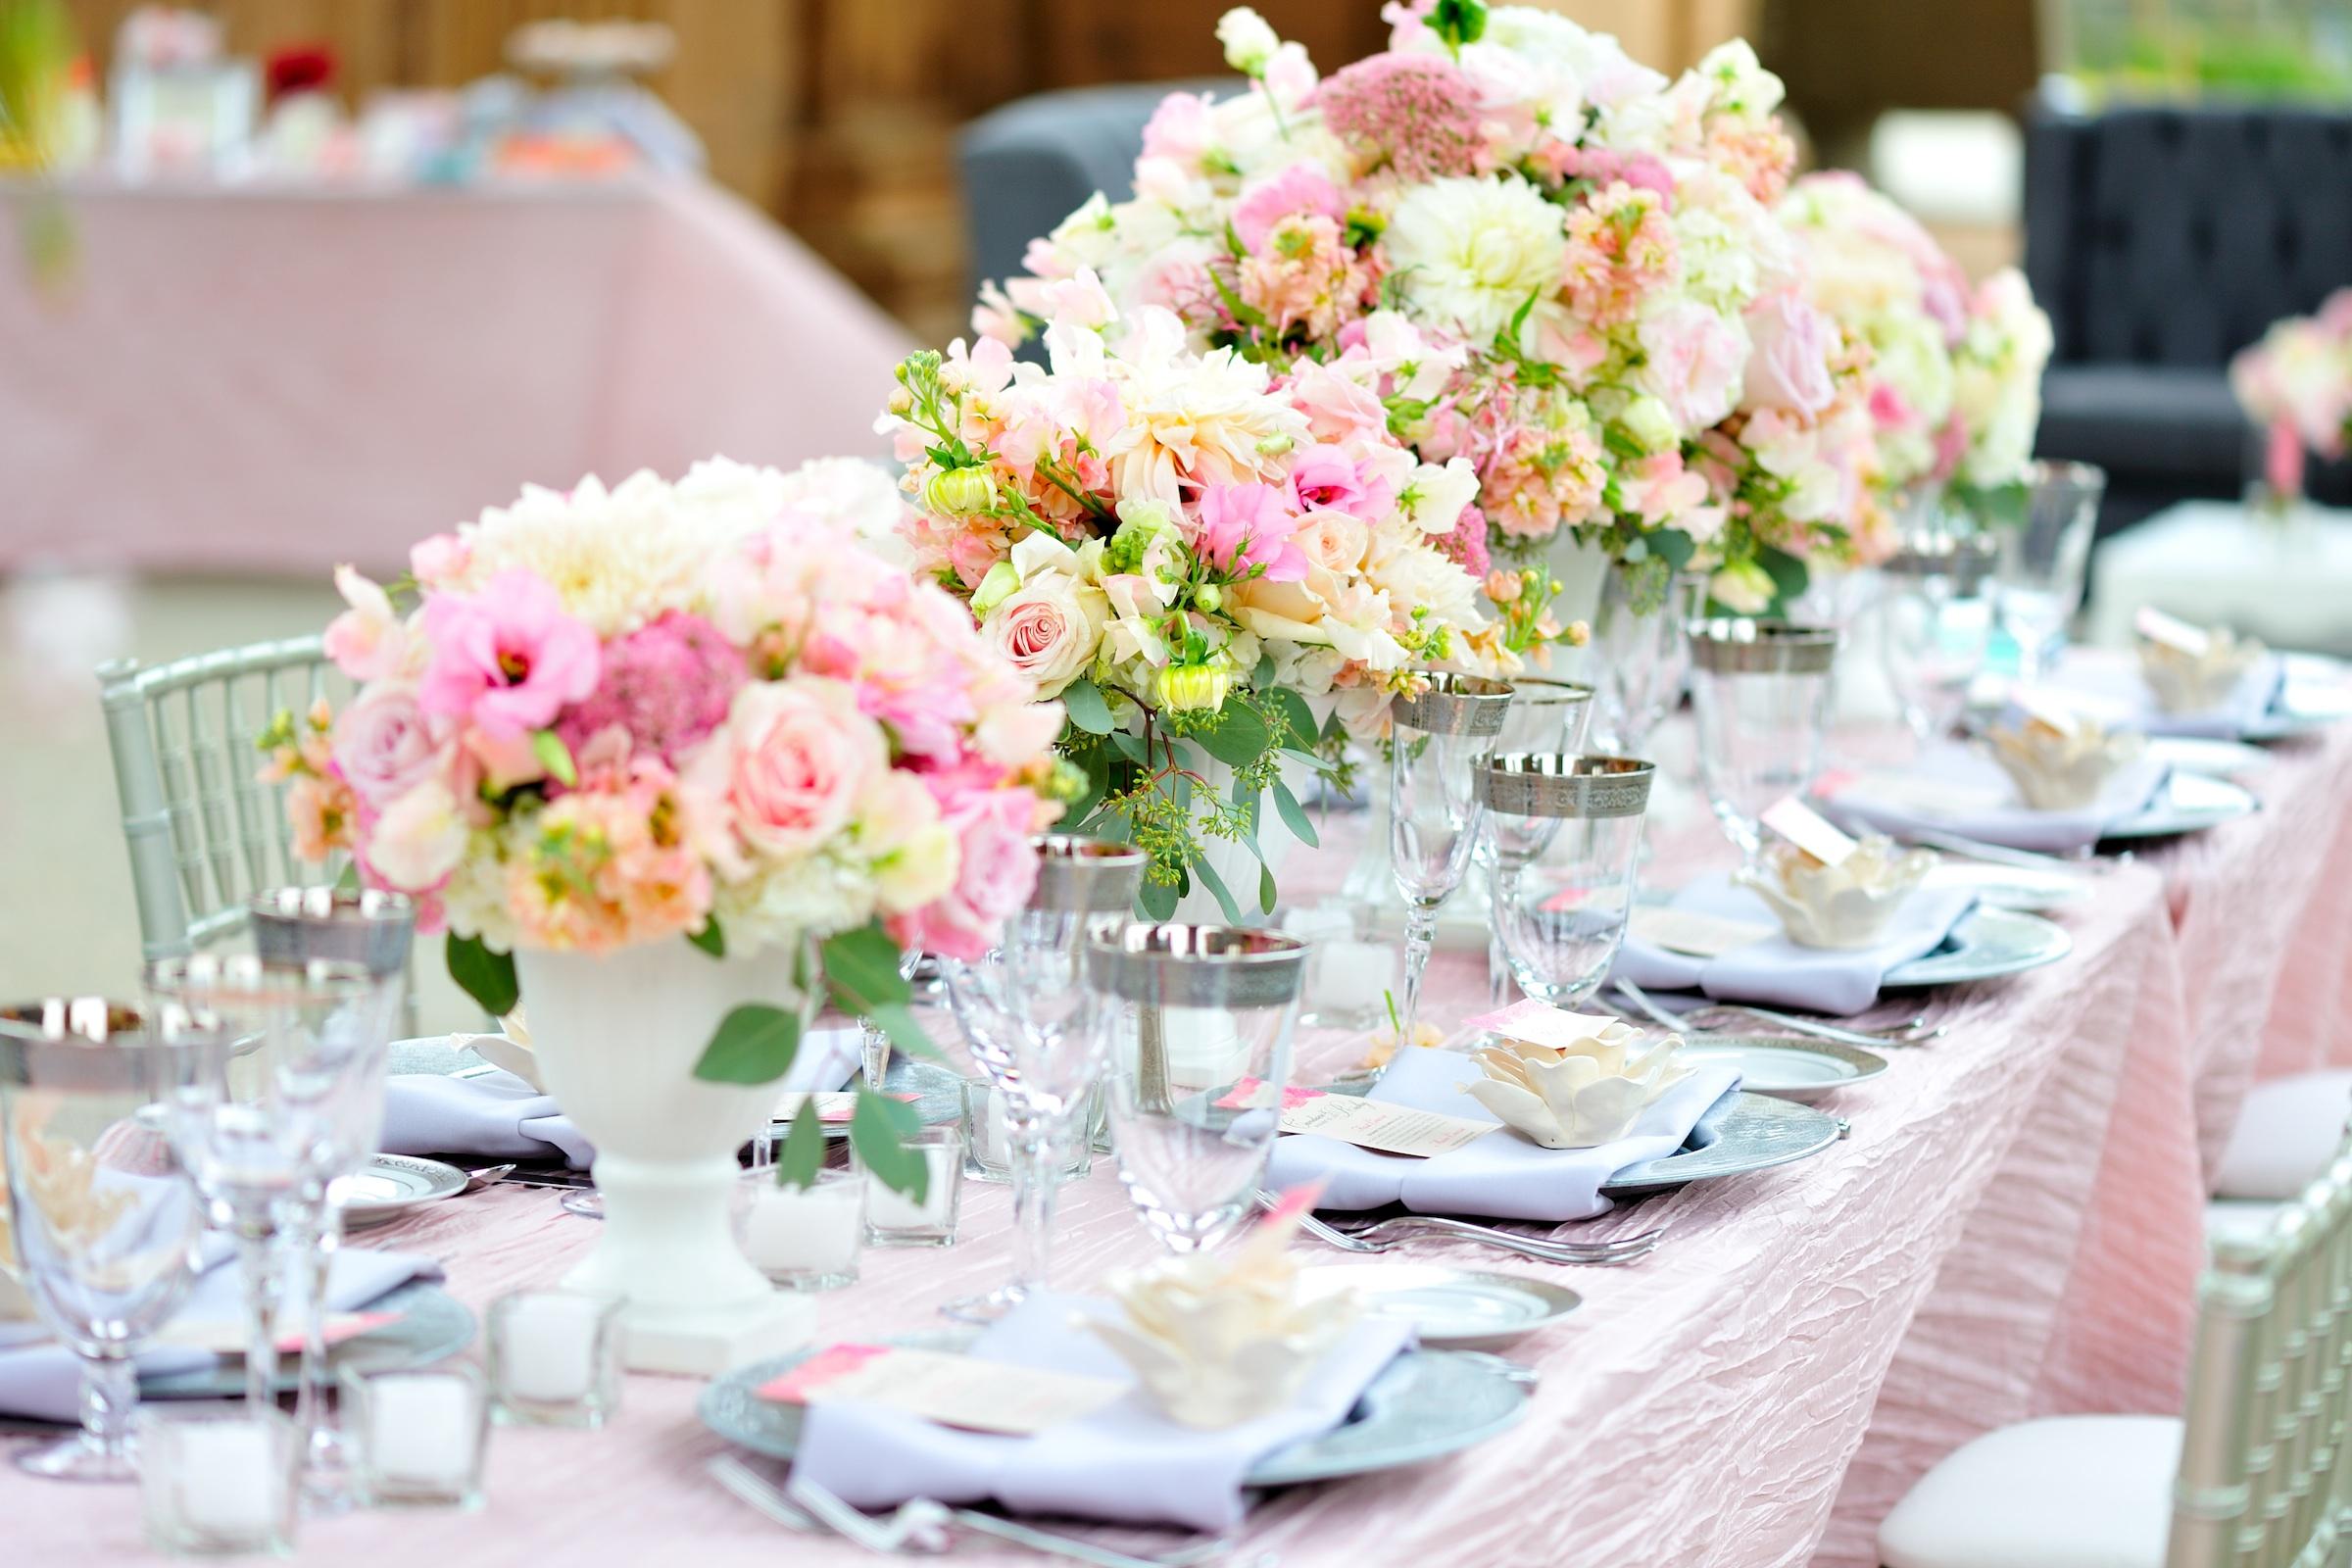 wedding-details-reception-decor-inspiration-by-jerri-woolworth-romantic-pastels.original